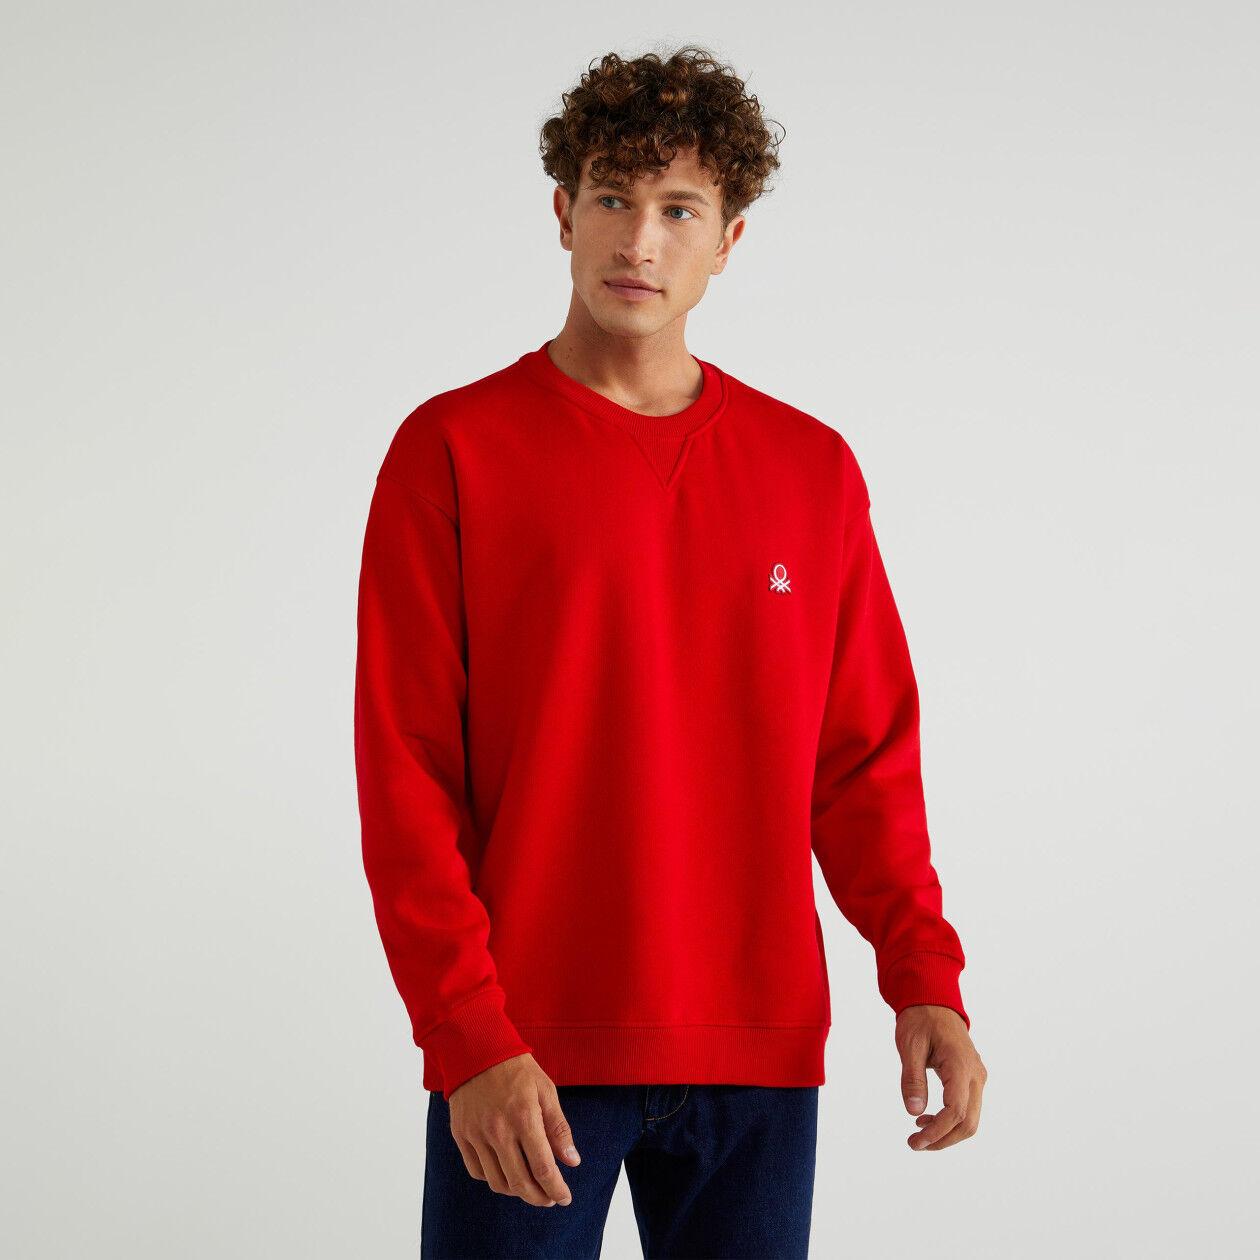 Crew neck sweatshirt with logo